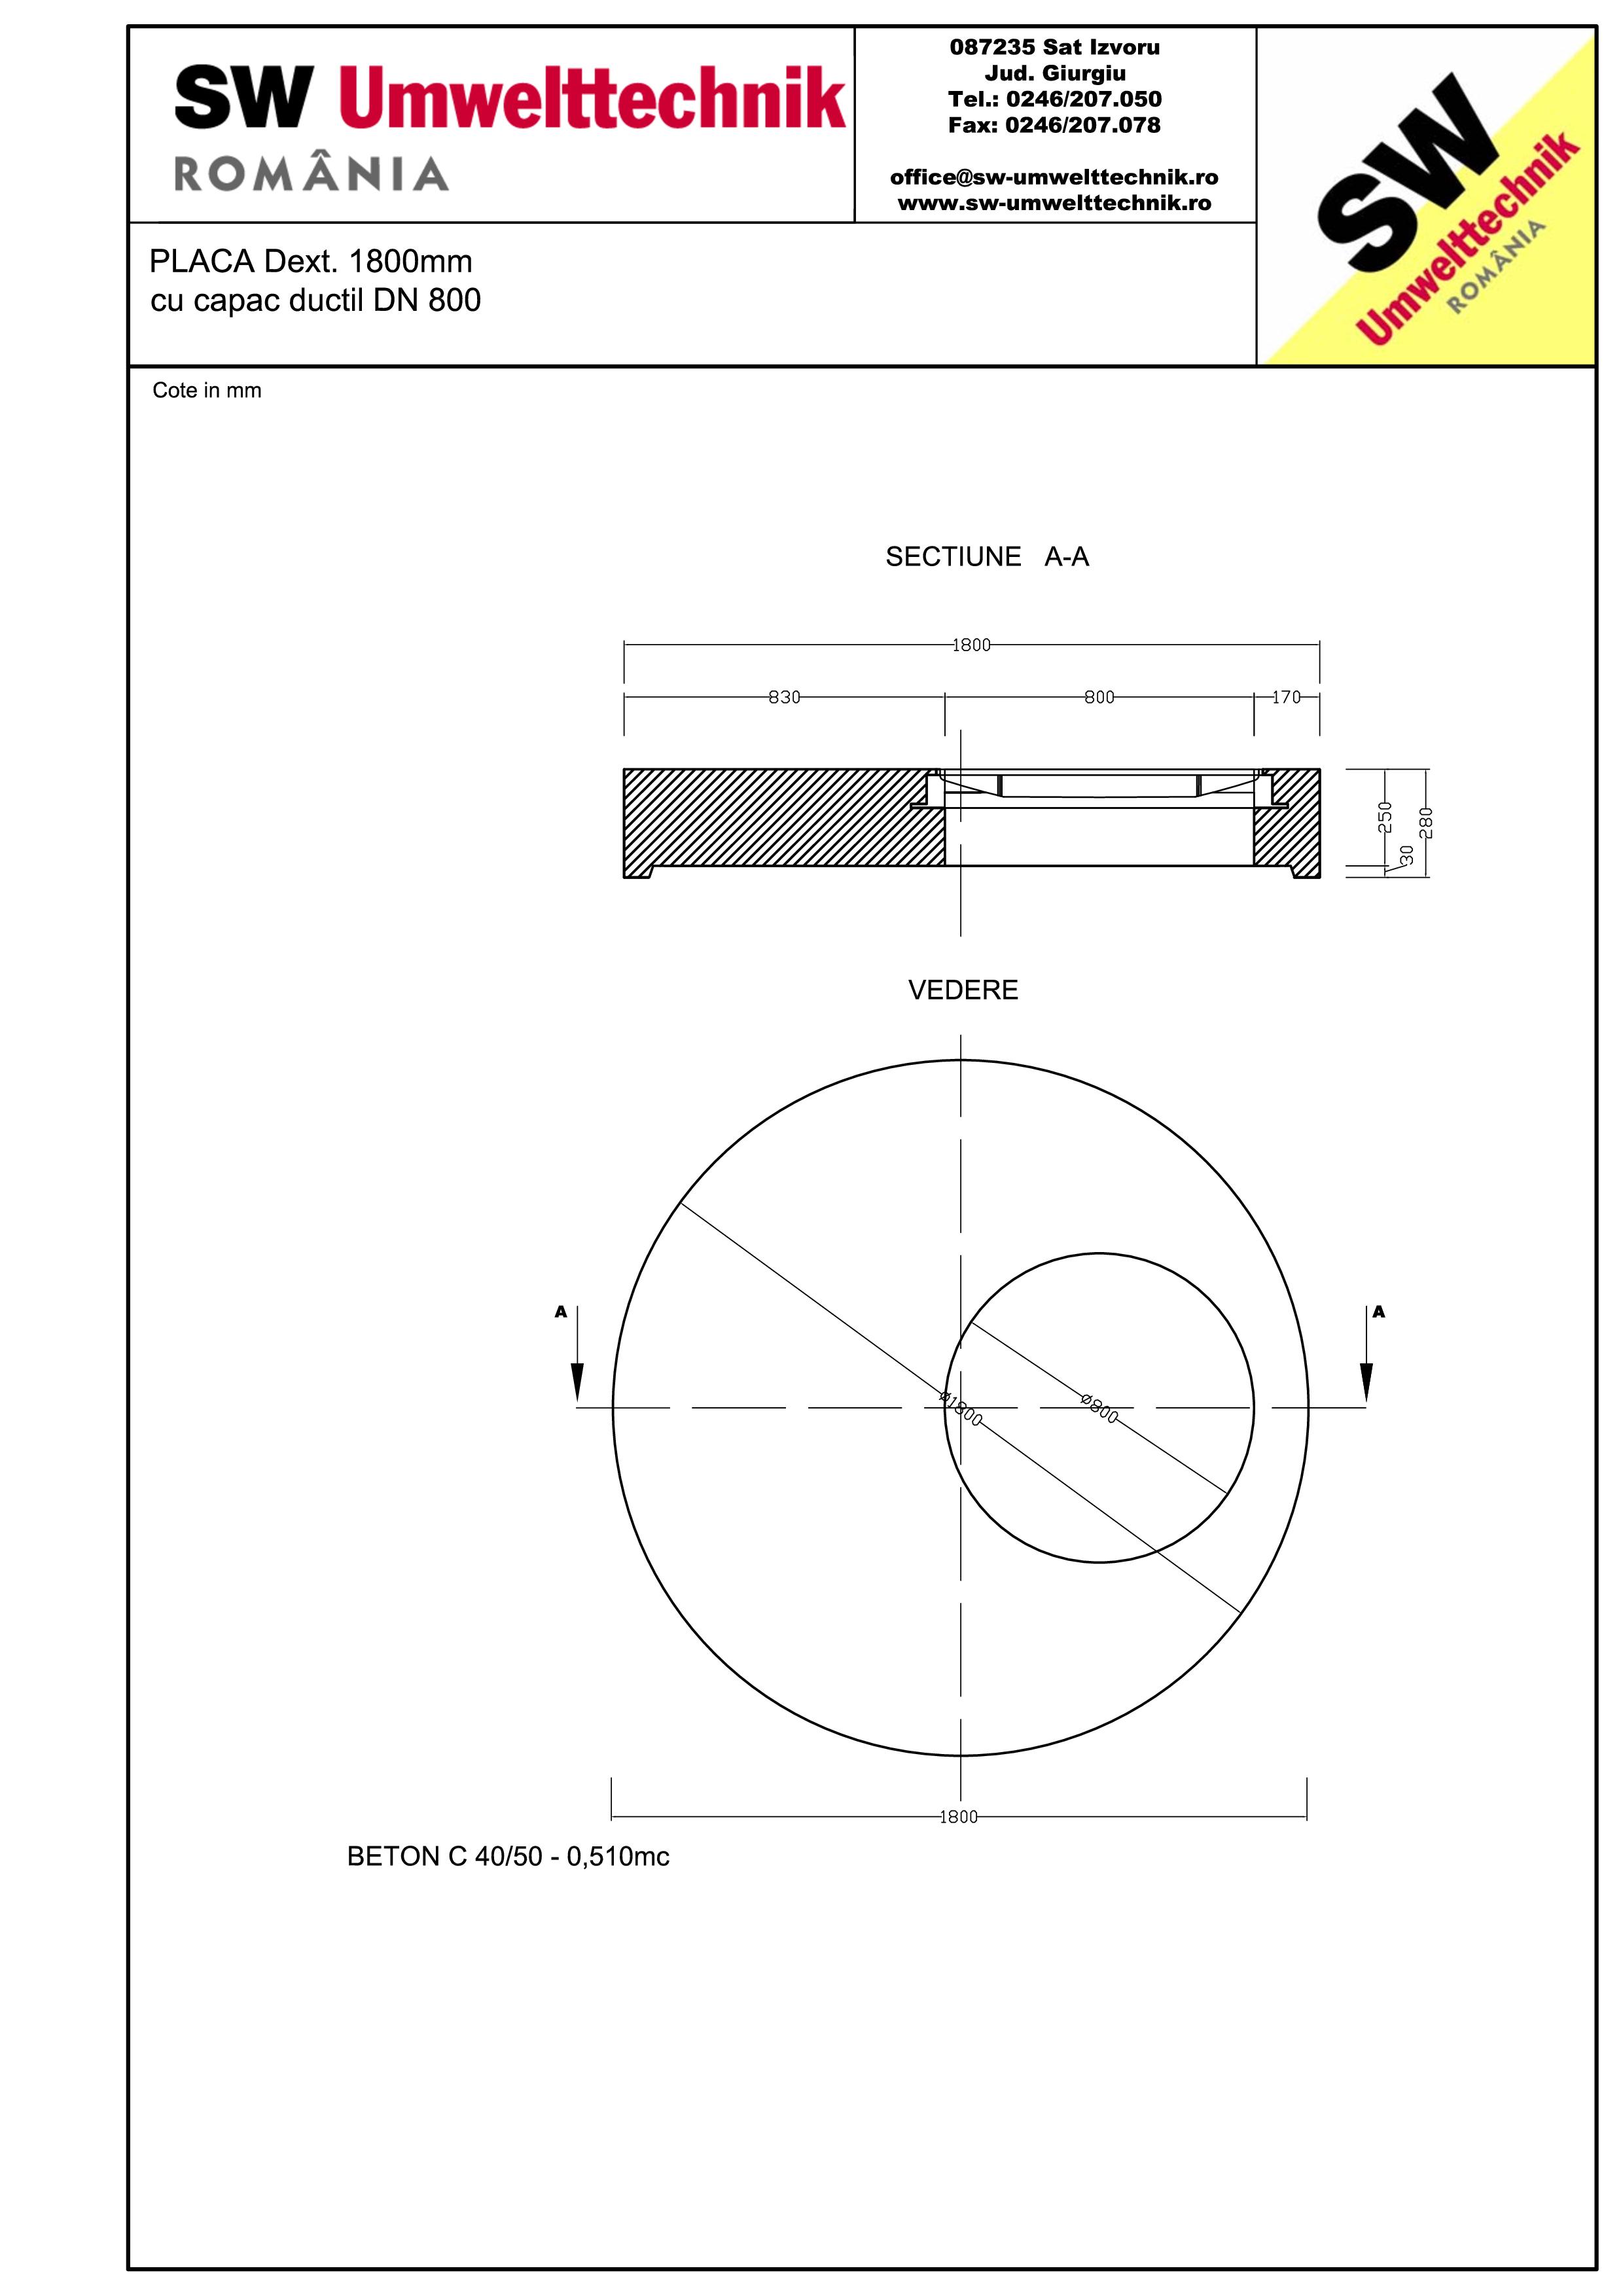 Pagina 1 - CAD-PDF Placa Dext.1800 H250 cu capac ductil DN800 SW UMWELTTECHNIK Detaliu de produs